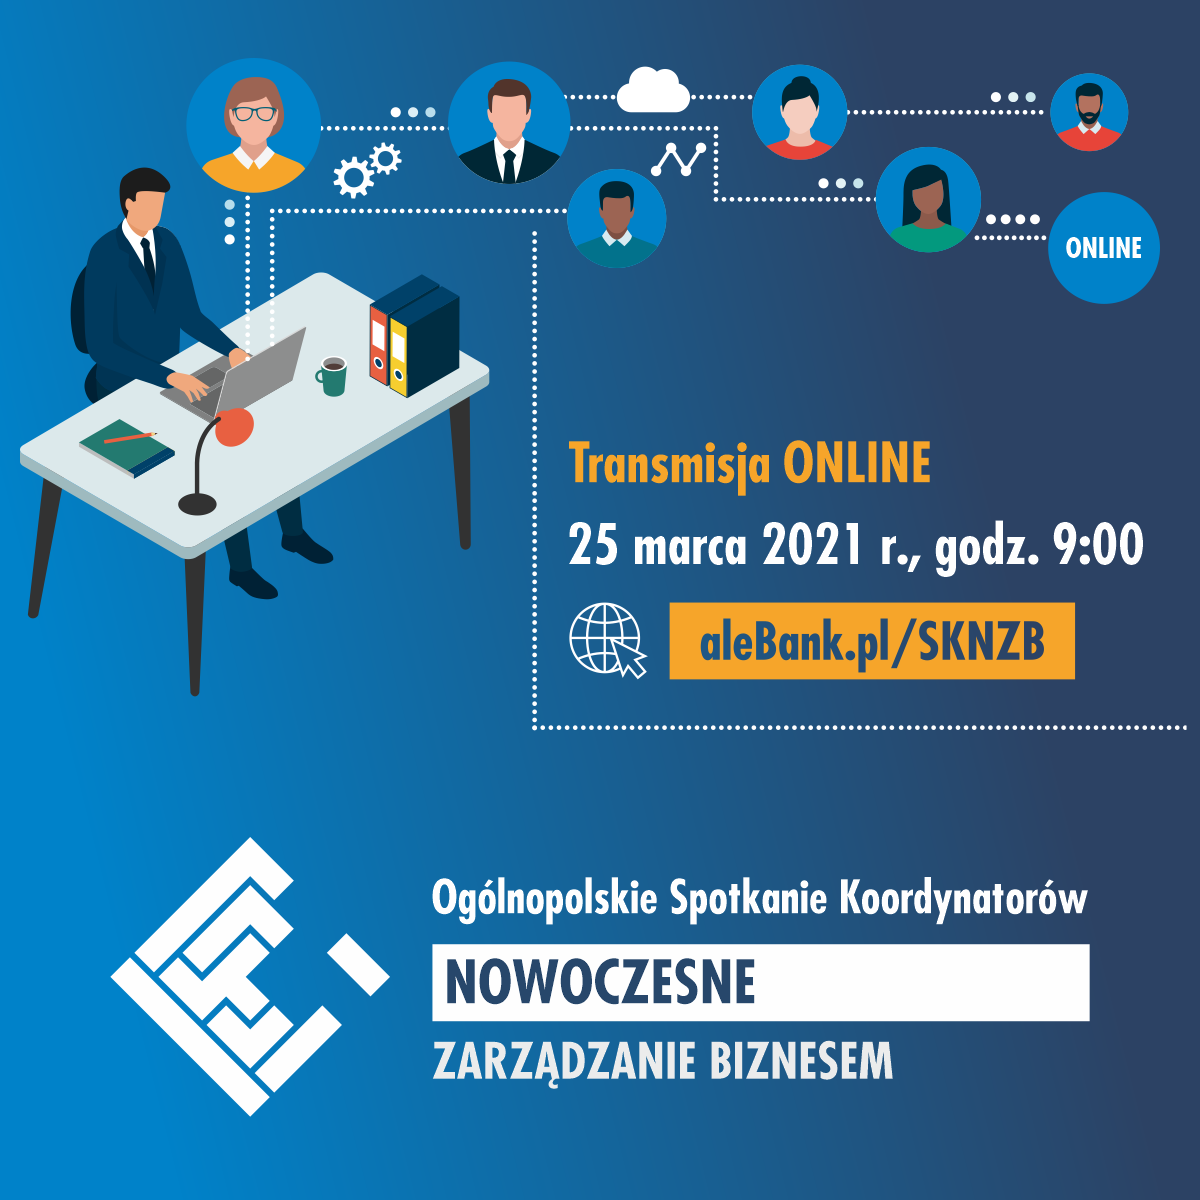 alebank.pl/SKNZB